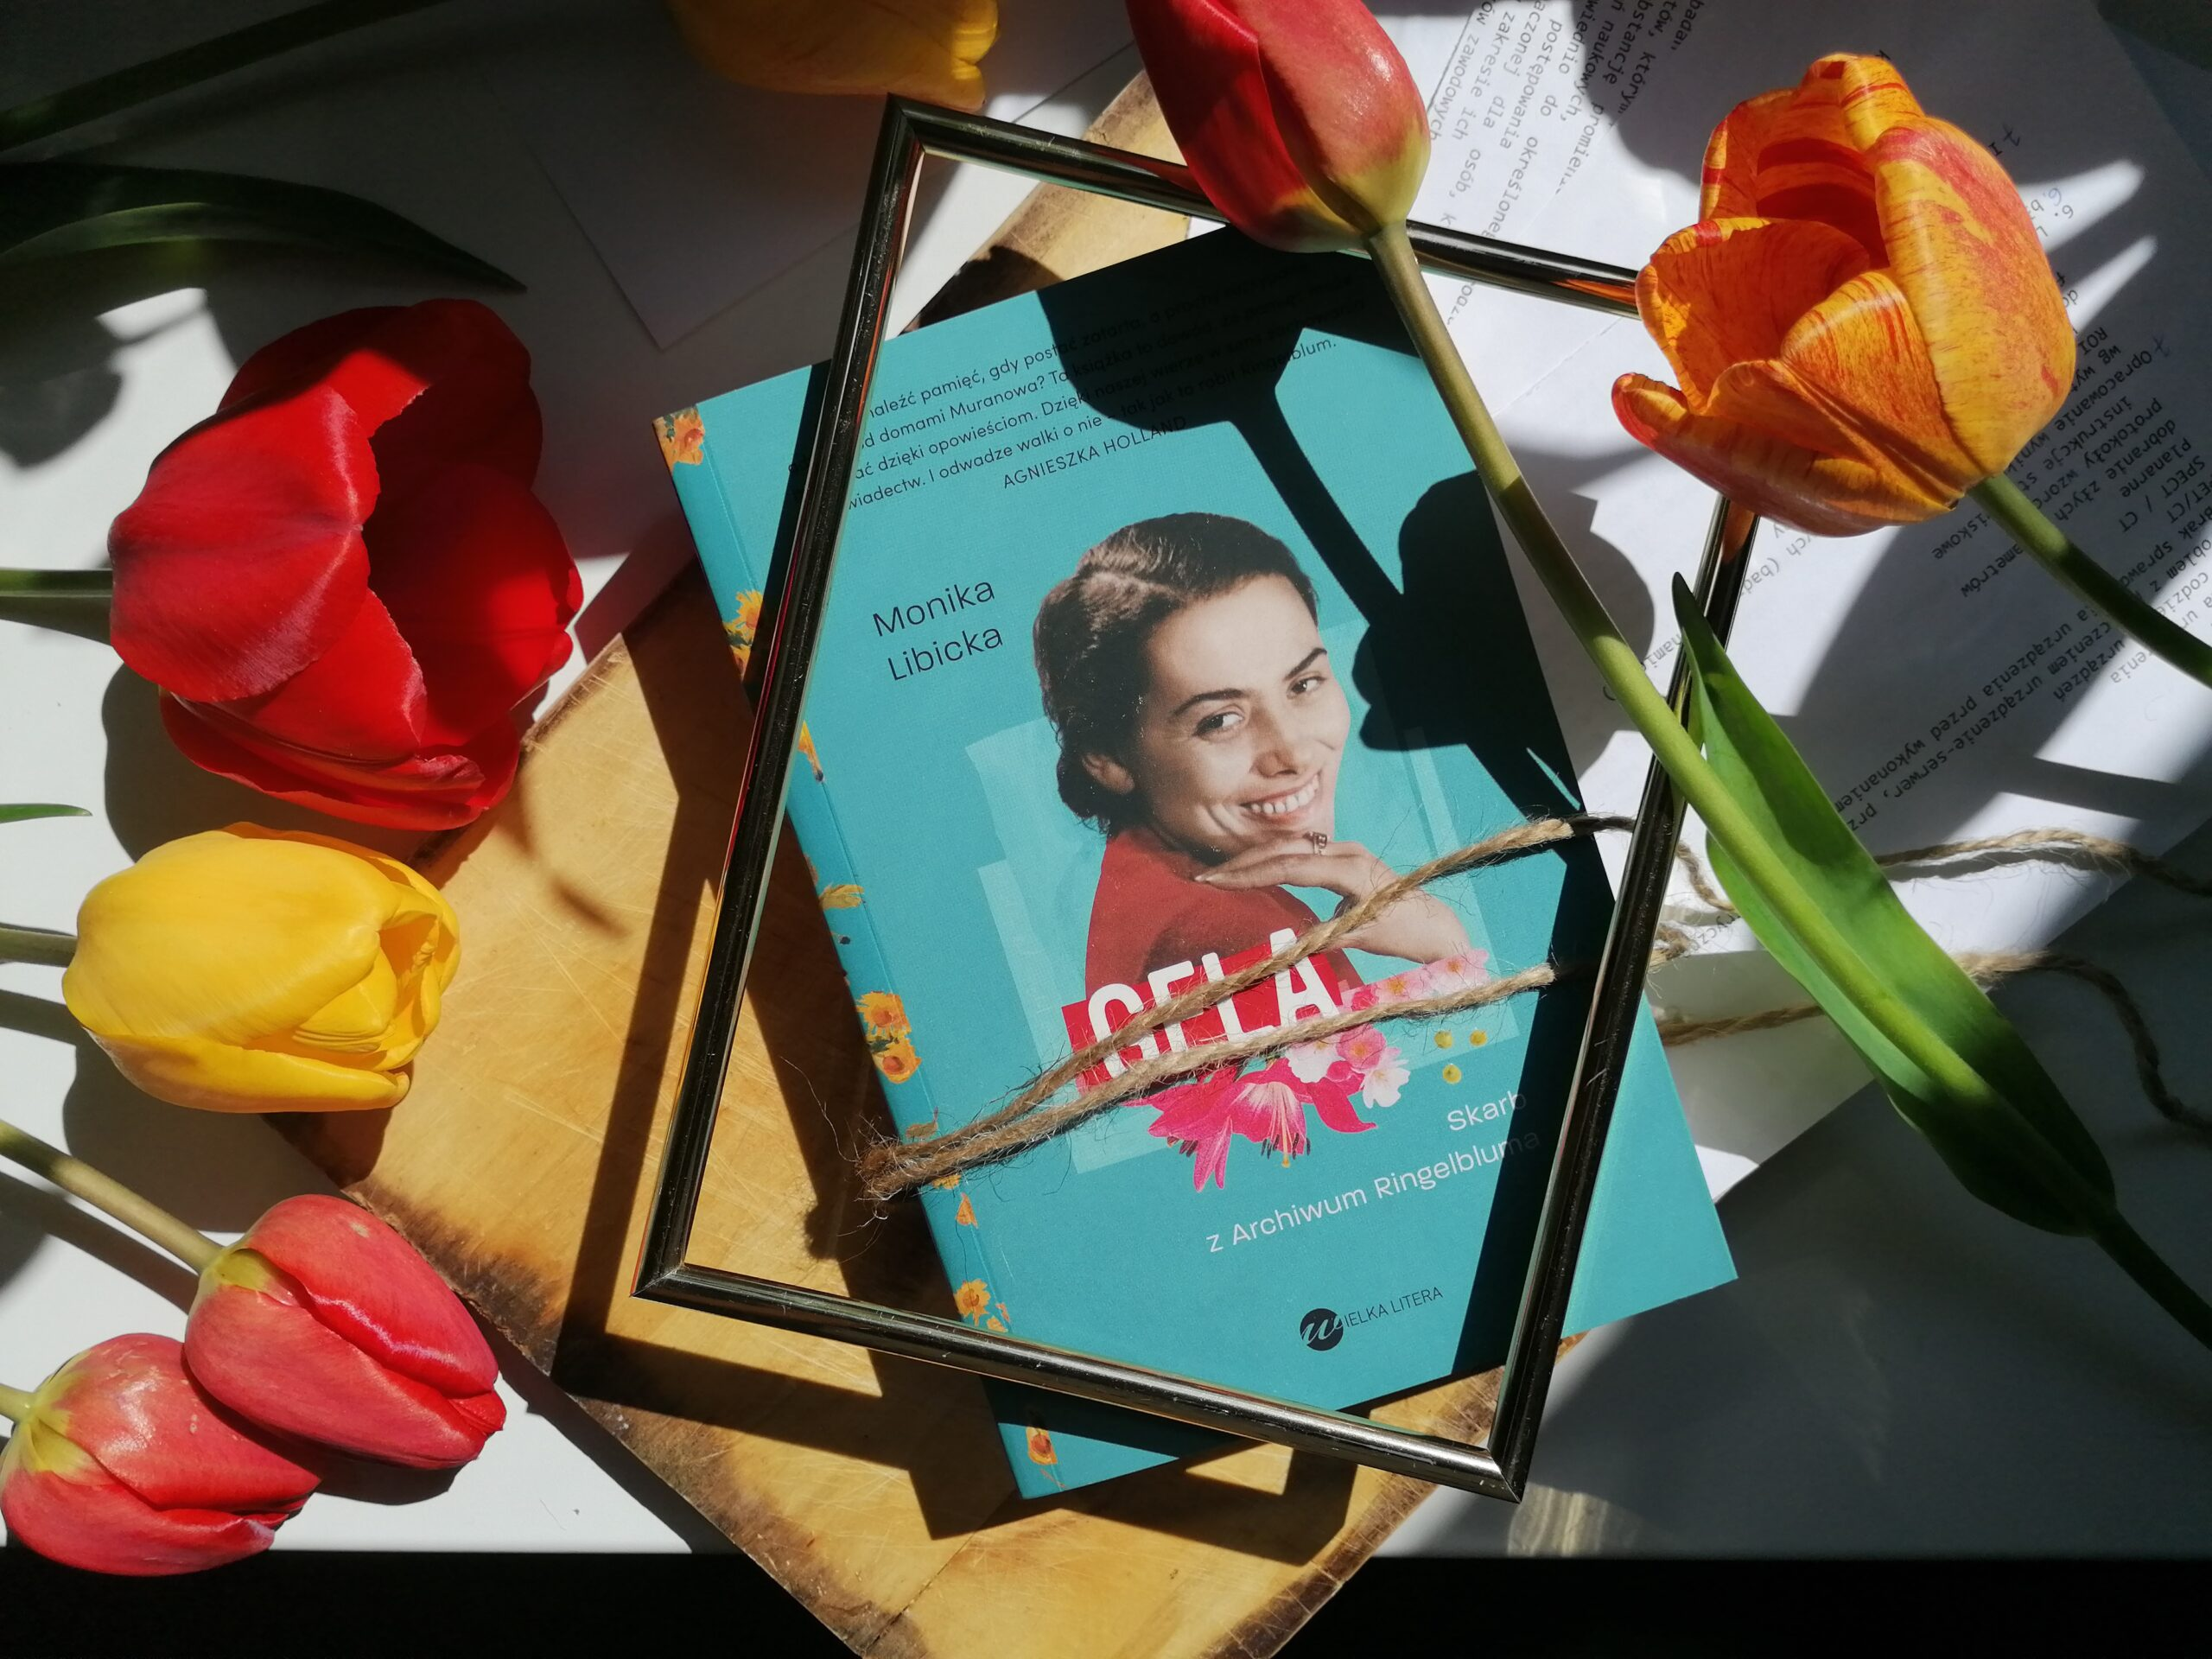 Recenzja: Gela. Skarb z Archiwum Ringelbluma - Monika Libicka